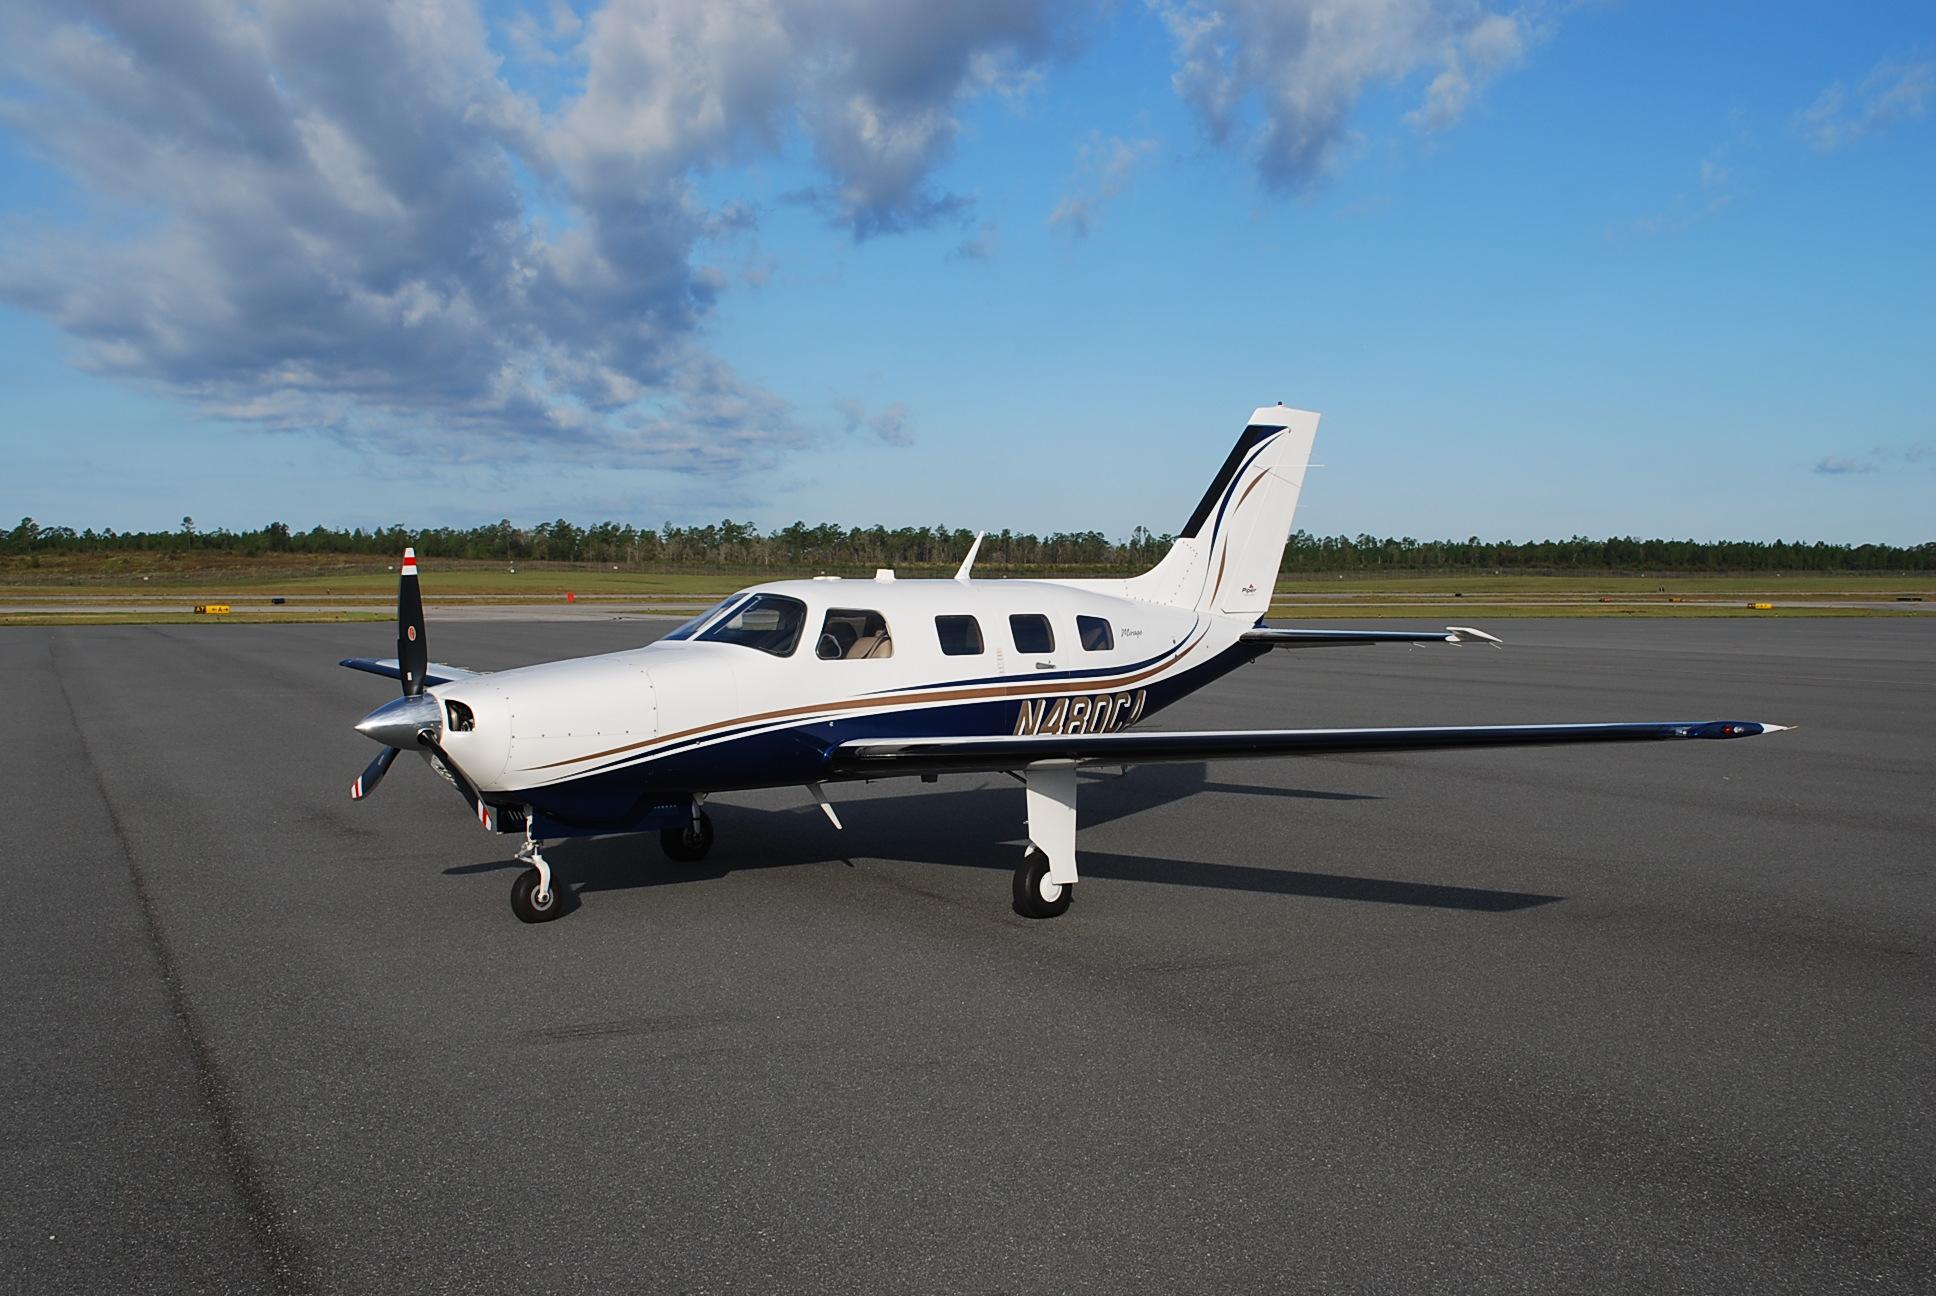 Malibu Mirage Pa 46 350p For Sale Globalair Com